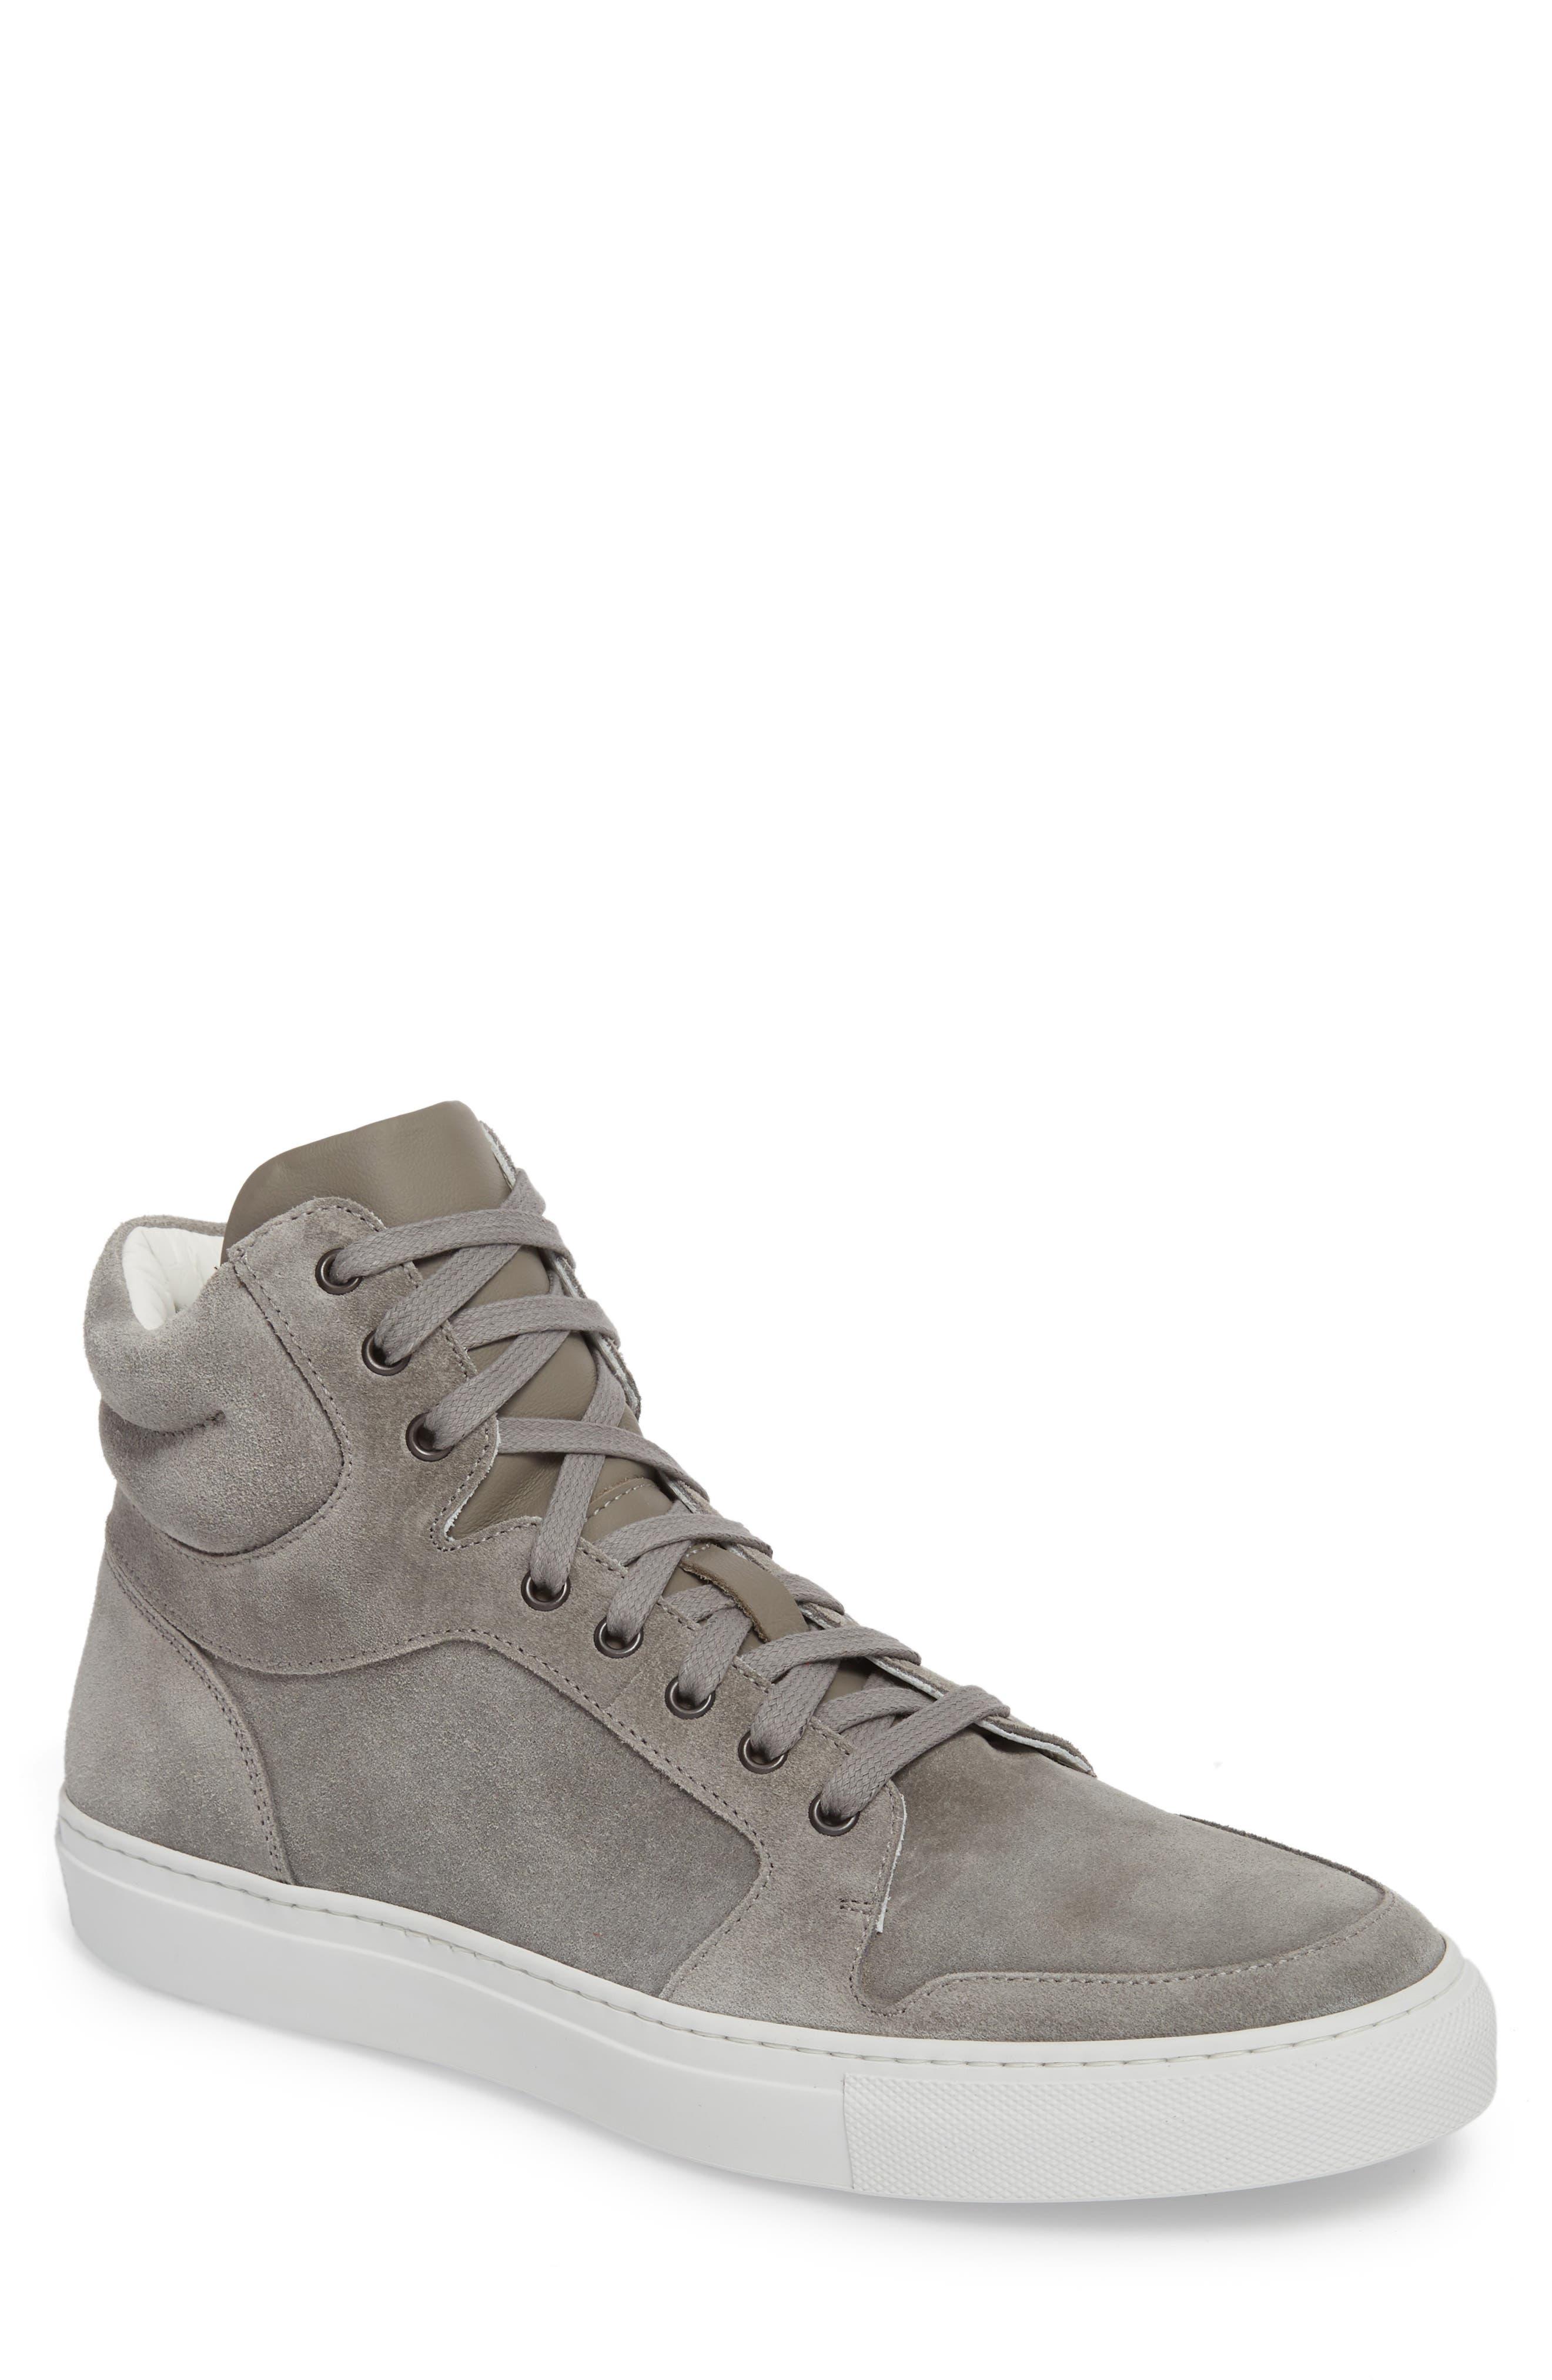 Belmont High Top Sneaker,                         Main,                         color, Grey Suede